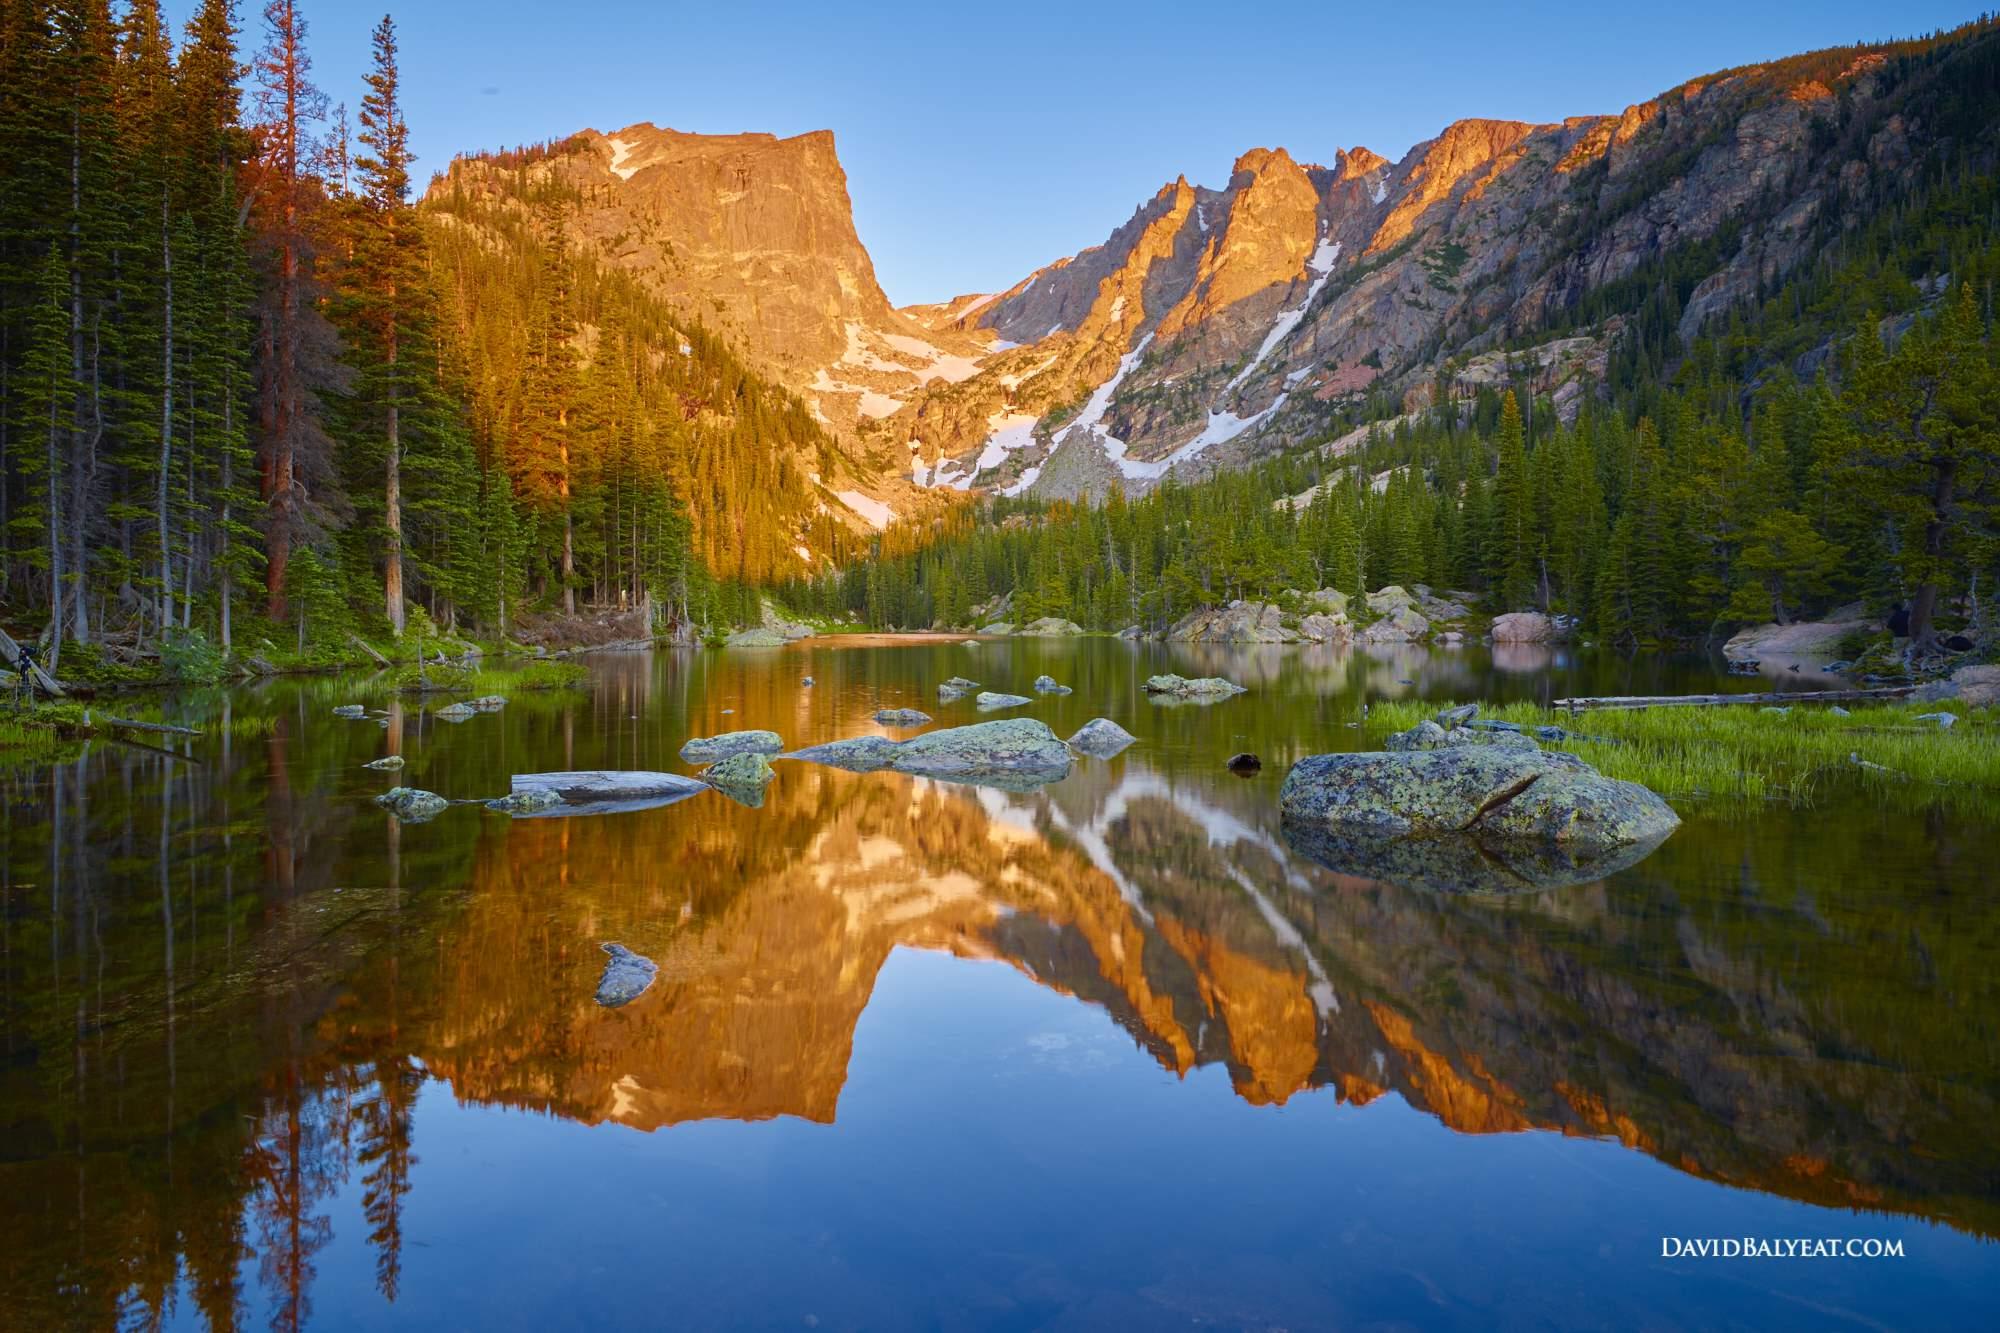 Hd Wallpaper Yosemite Fire Fall Dream Lake Colorado David Balyeat Photography